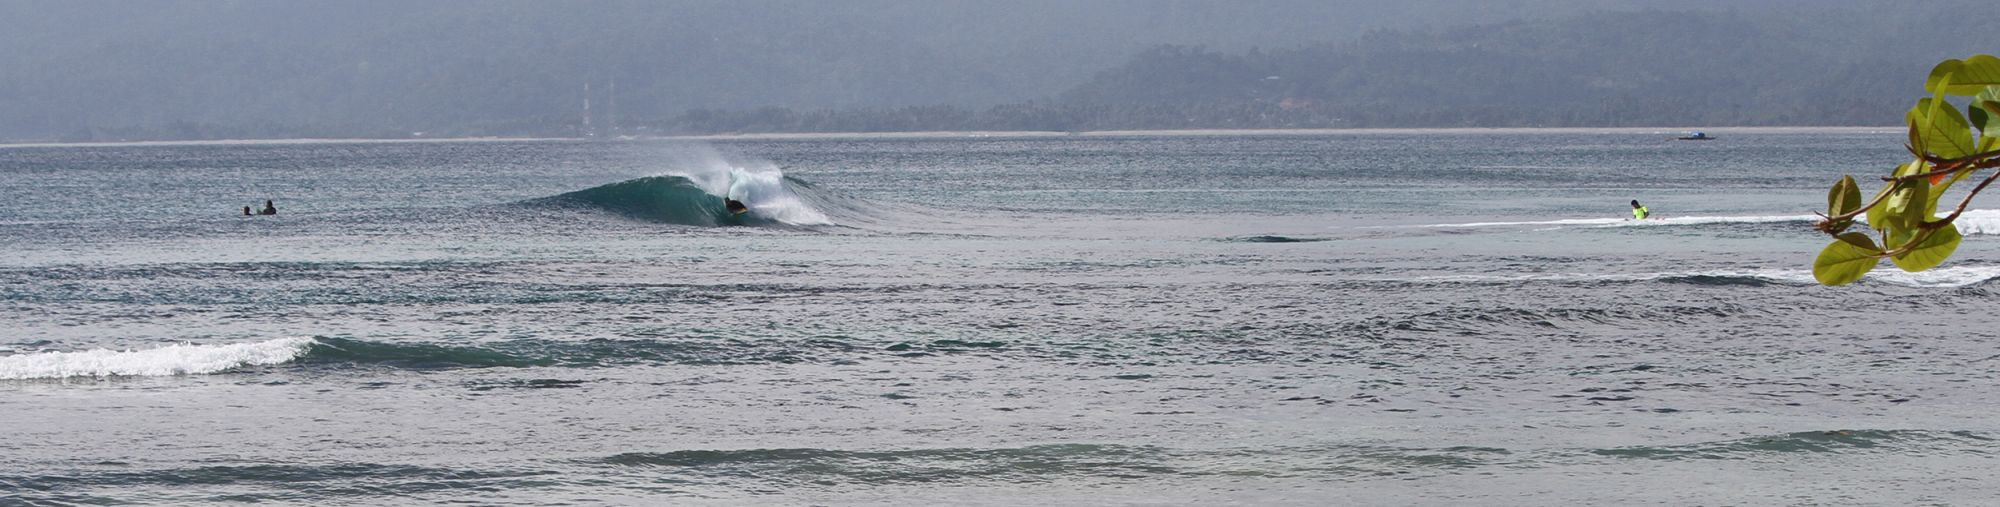 krui surfing